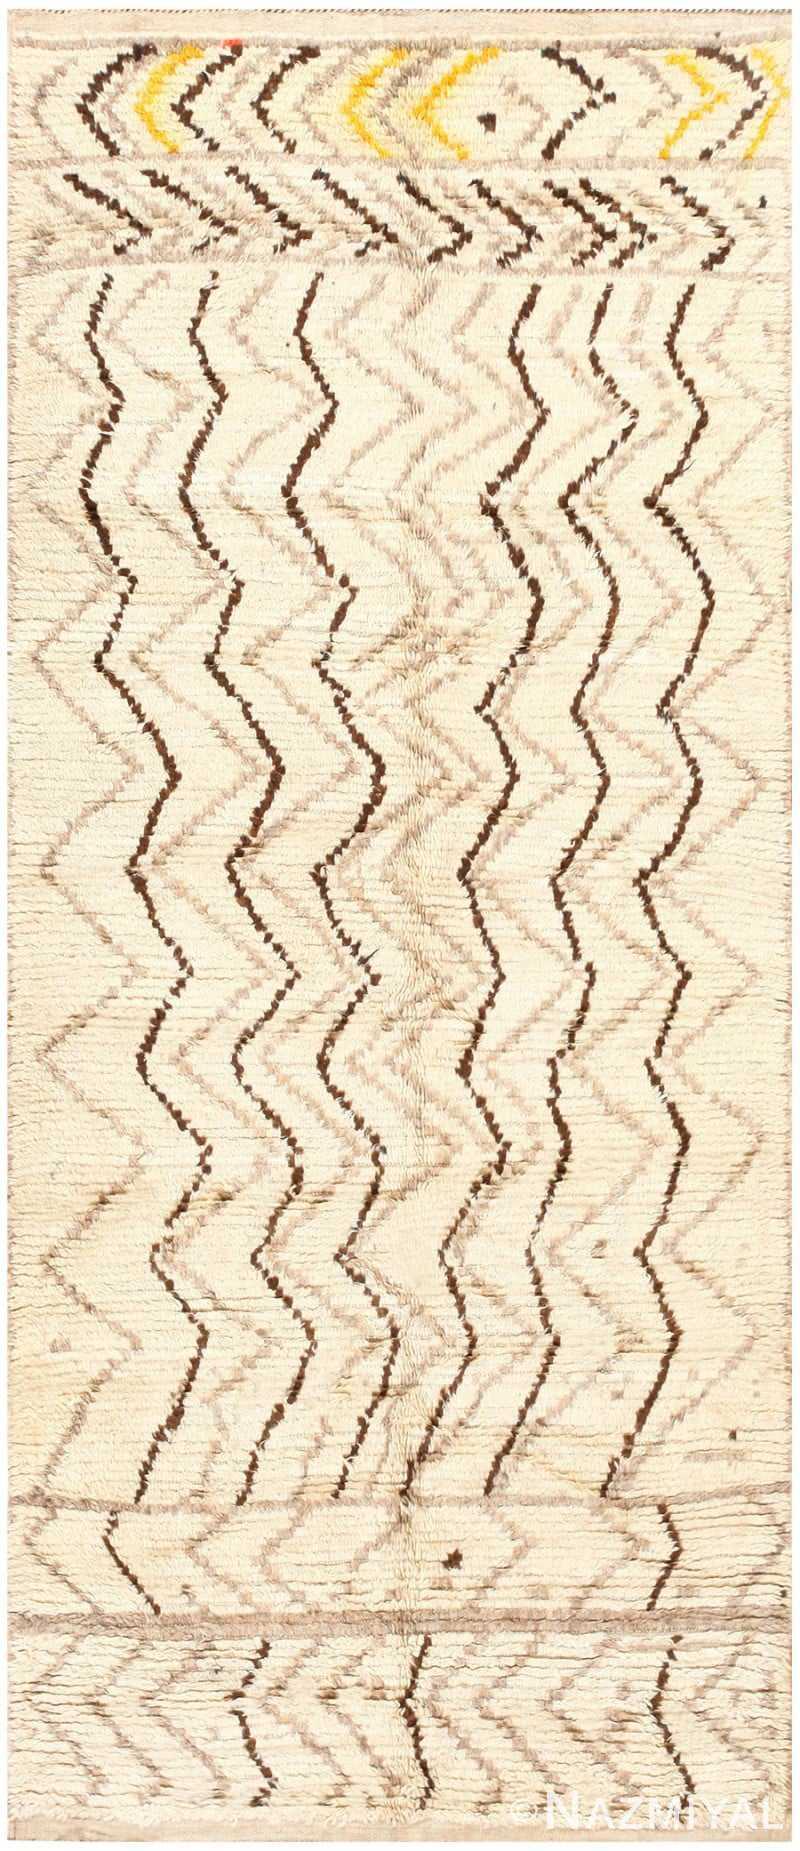 Vintage Tribal Moroccan Rug 48395 Detail/Large View